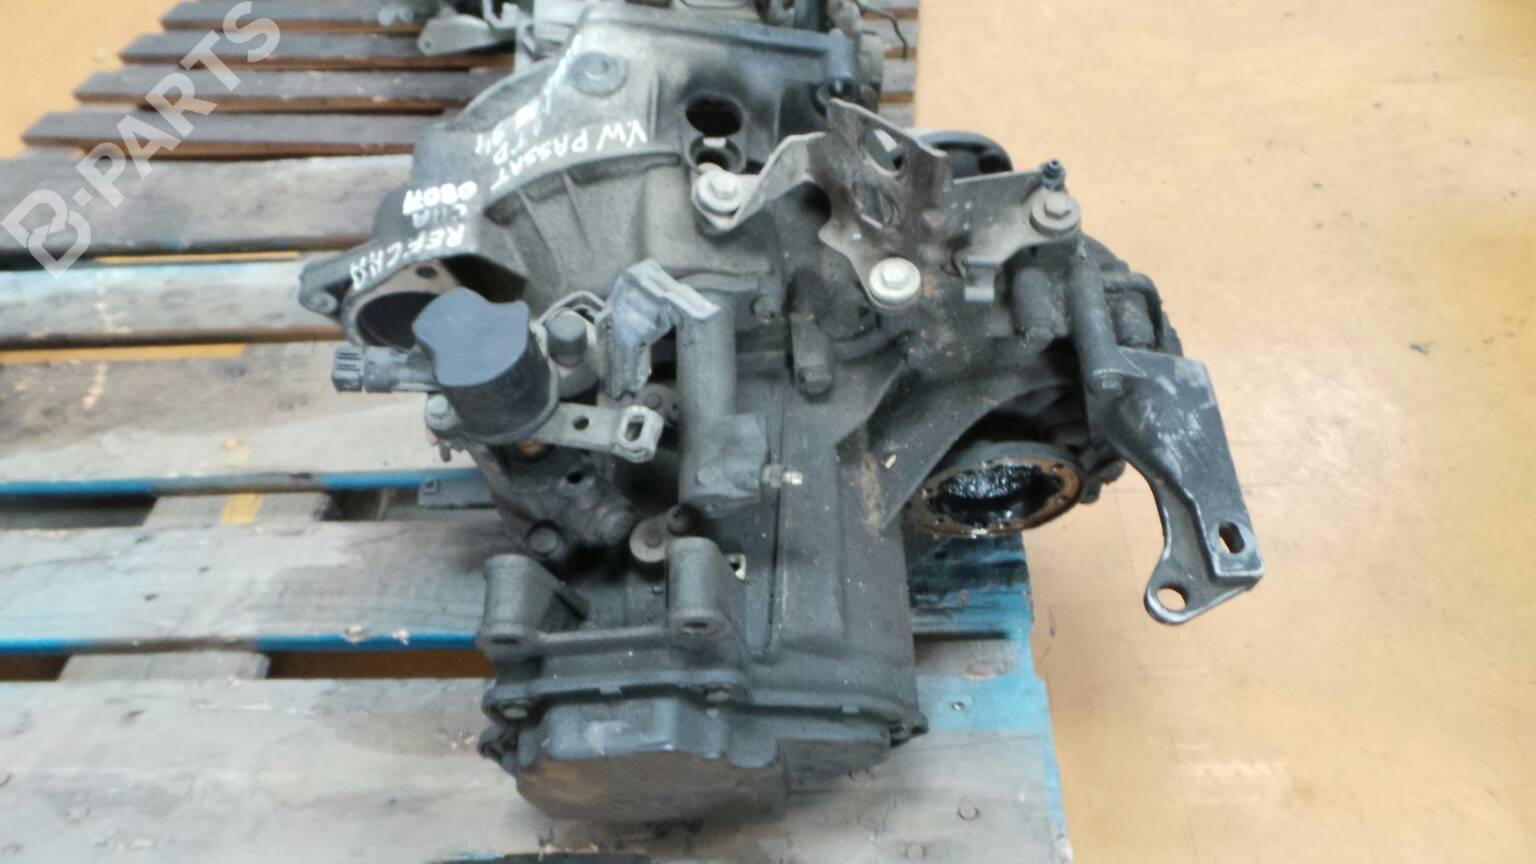 Manual Gearbox Vw Passat 3a2 35i 19 Td 25450 Engine Part Diagram Cha 08074 75hp